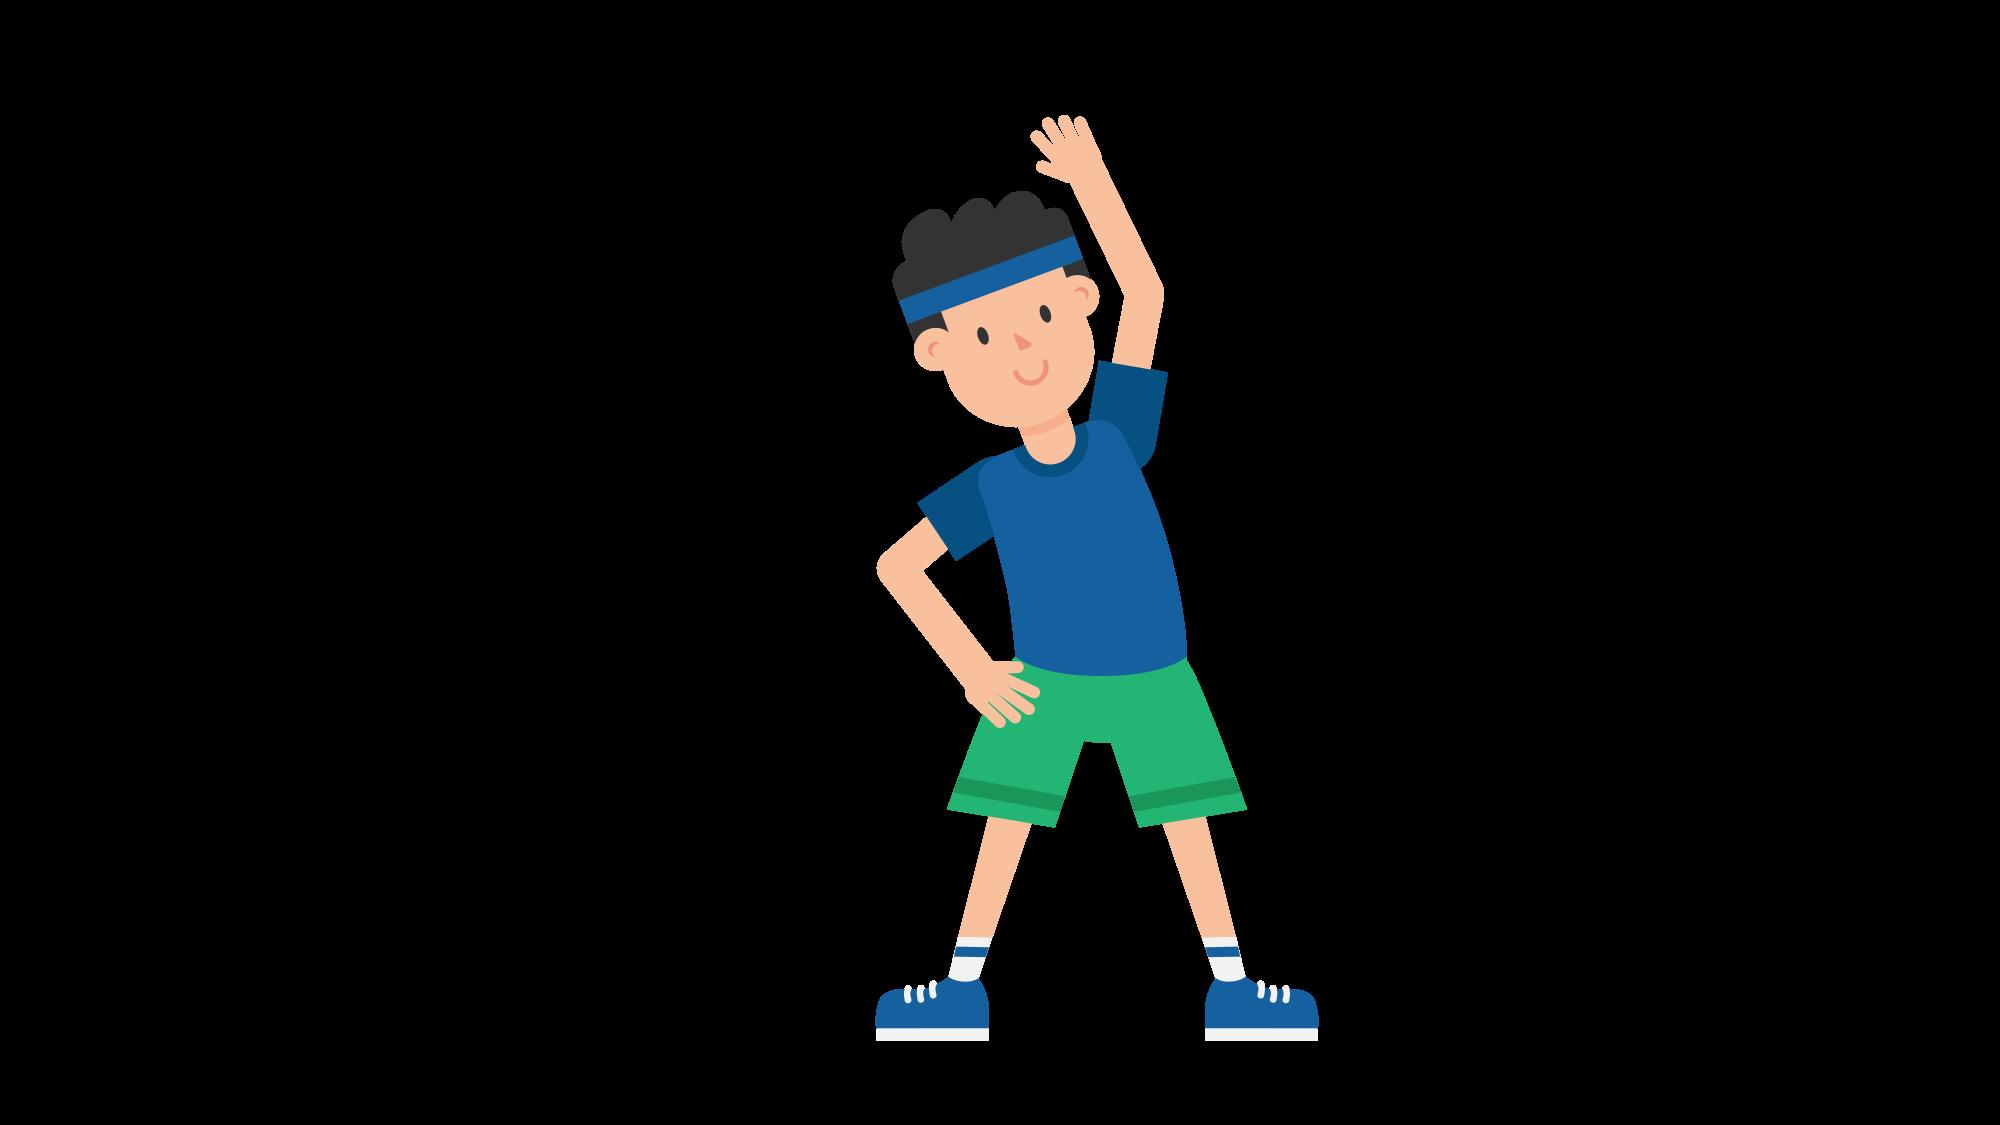 Exercise clipart arm exercise, Exercise arm exercise.